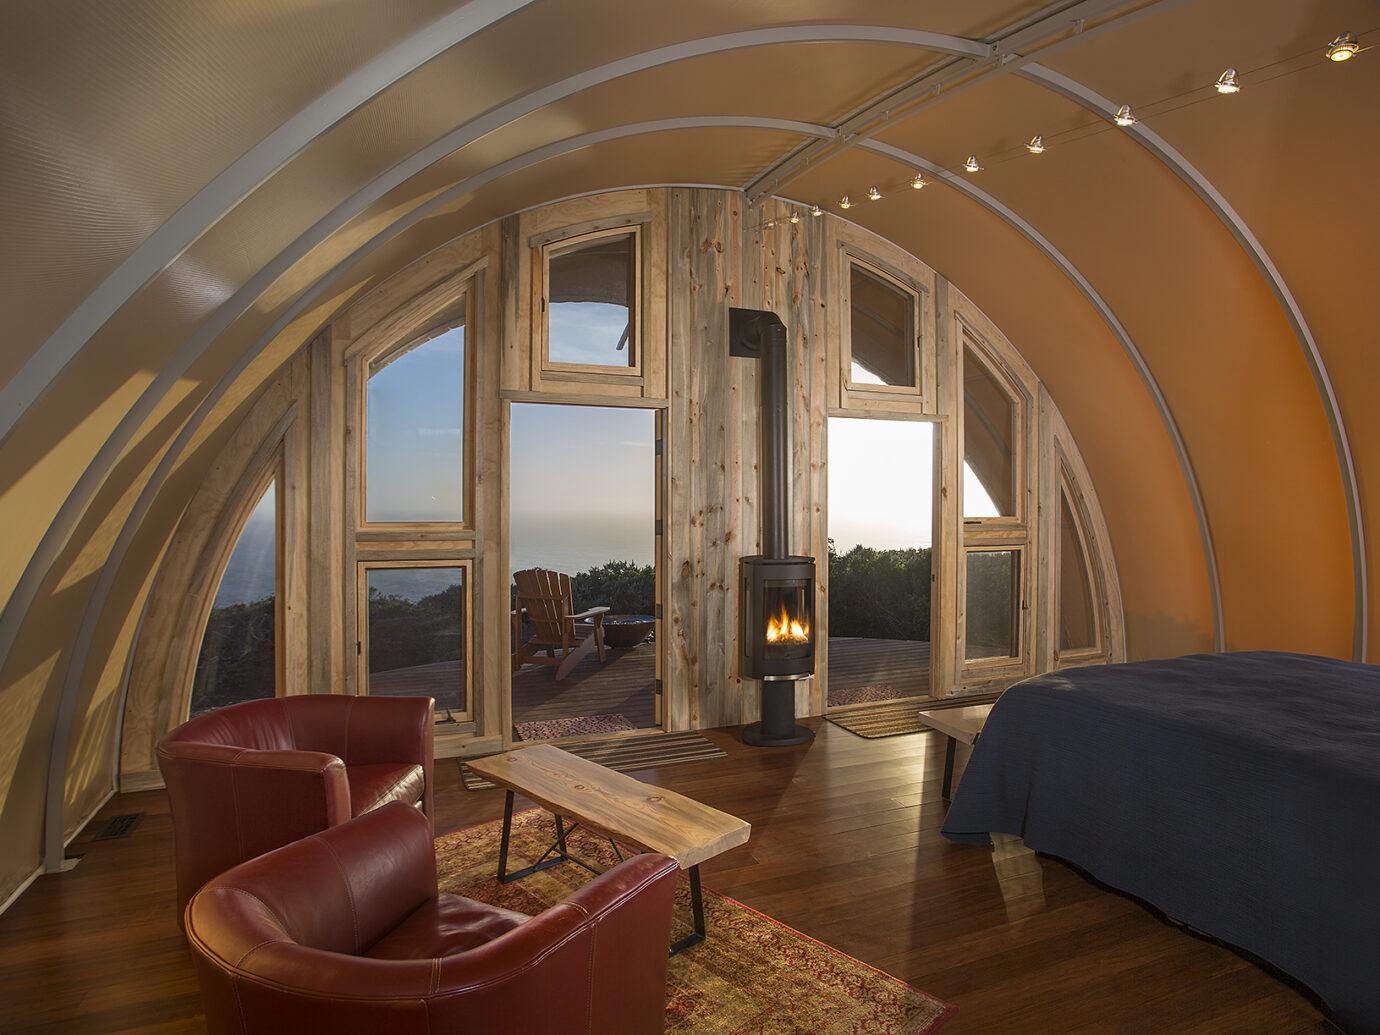 Interior view of Treebones Resort